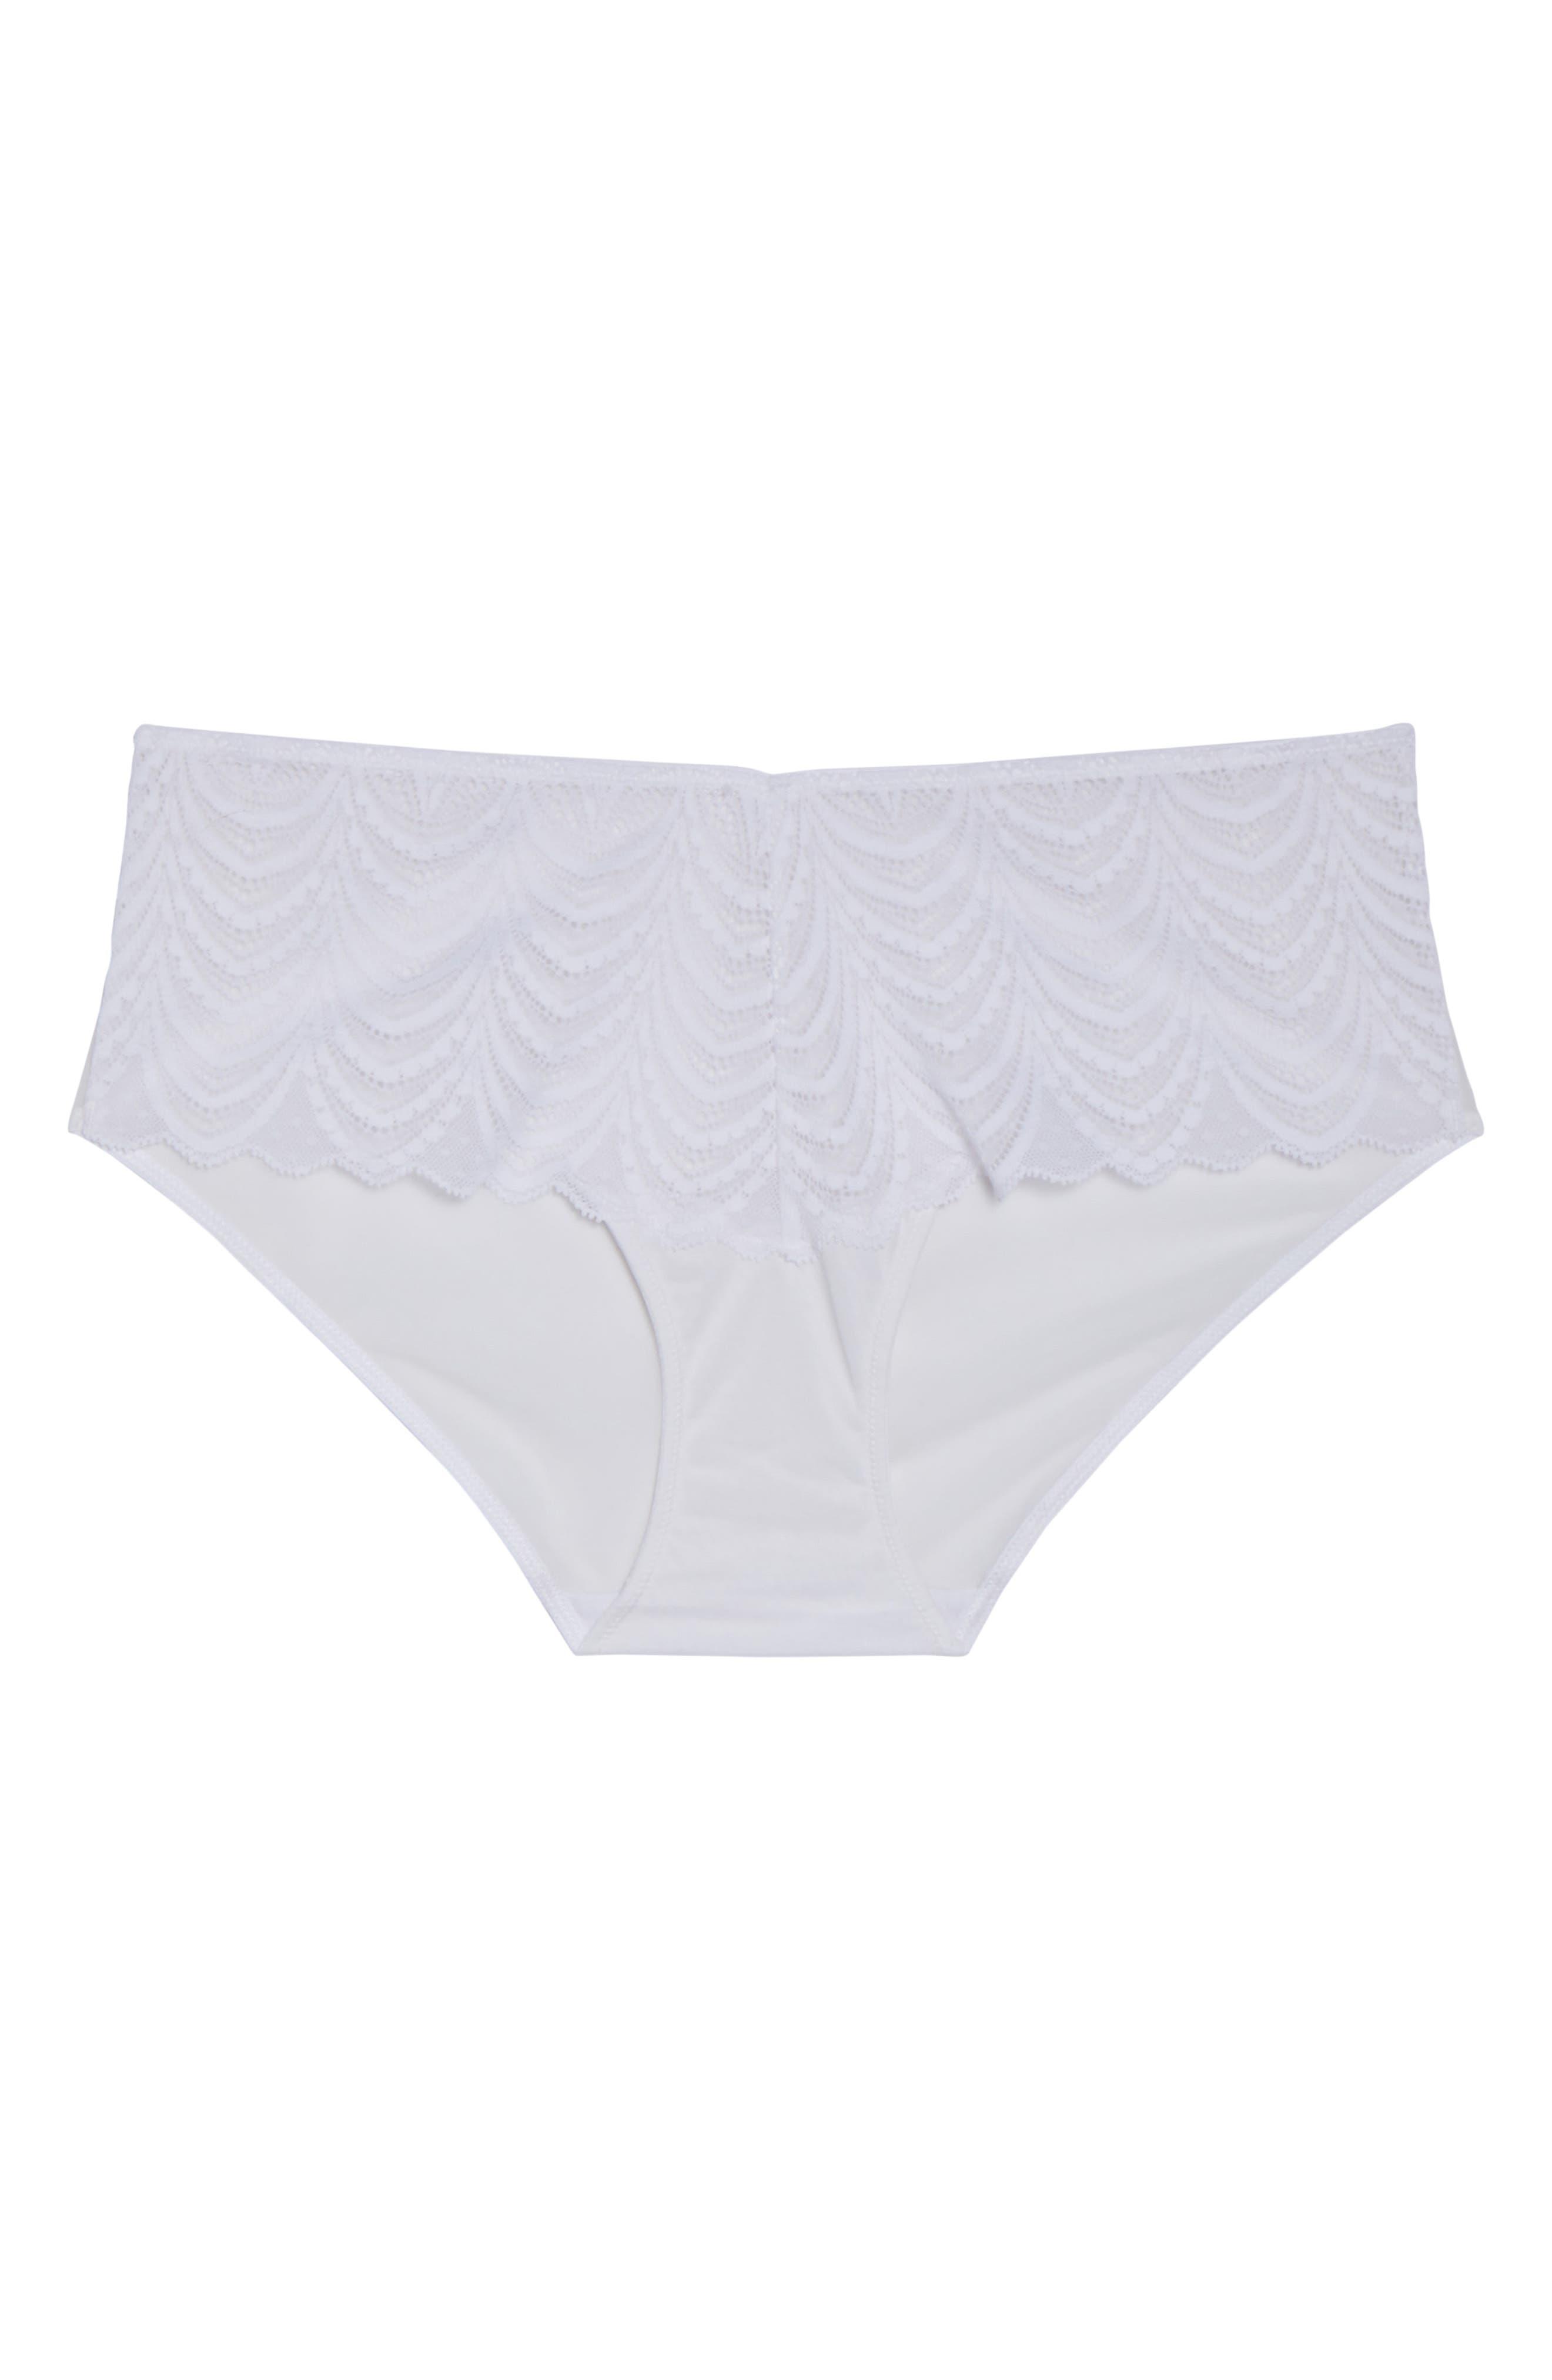 Art Deco Hipster Bikini,                             Alternate thumbnail 8, color,                             White